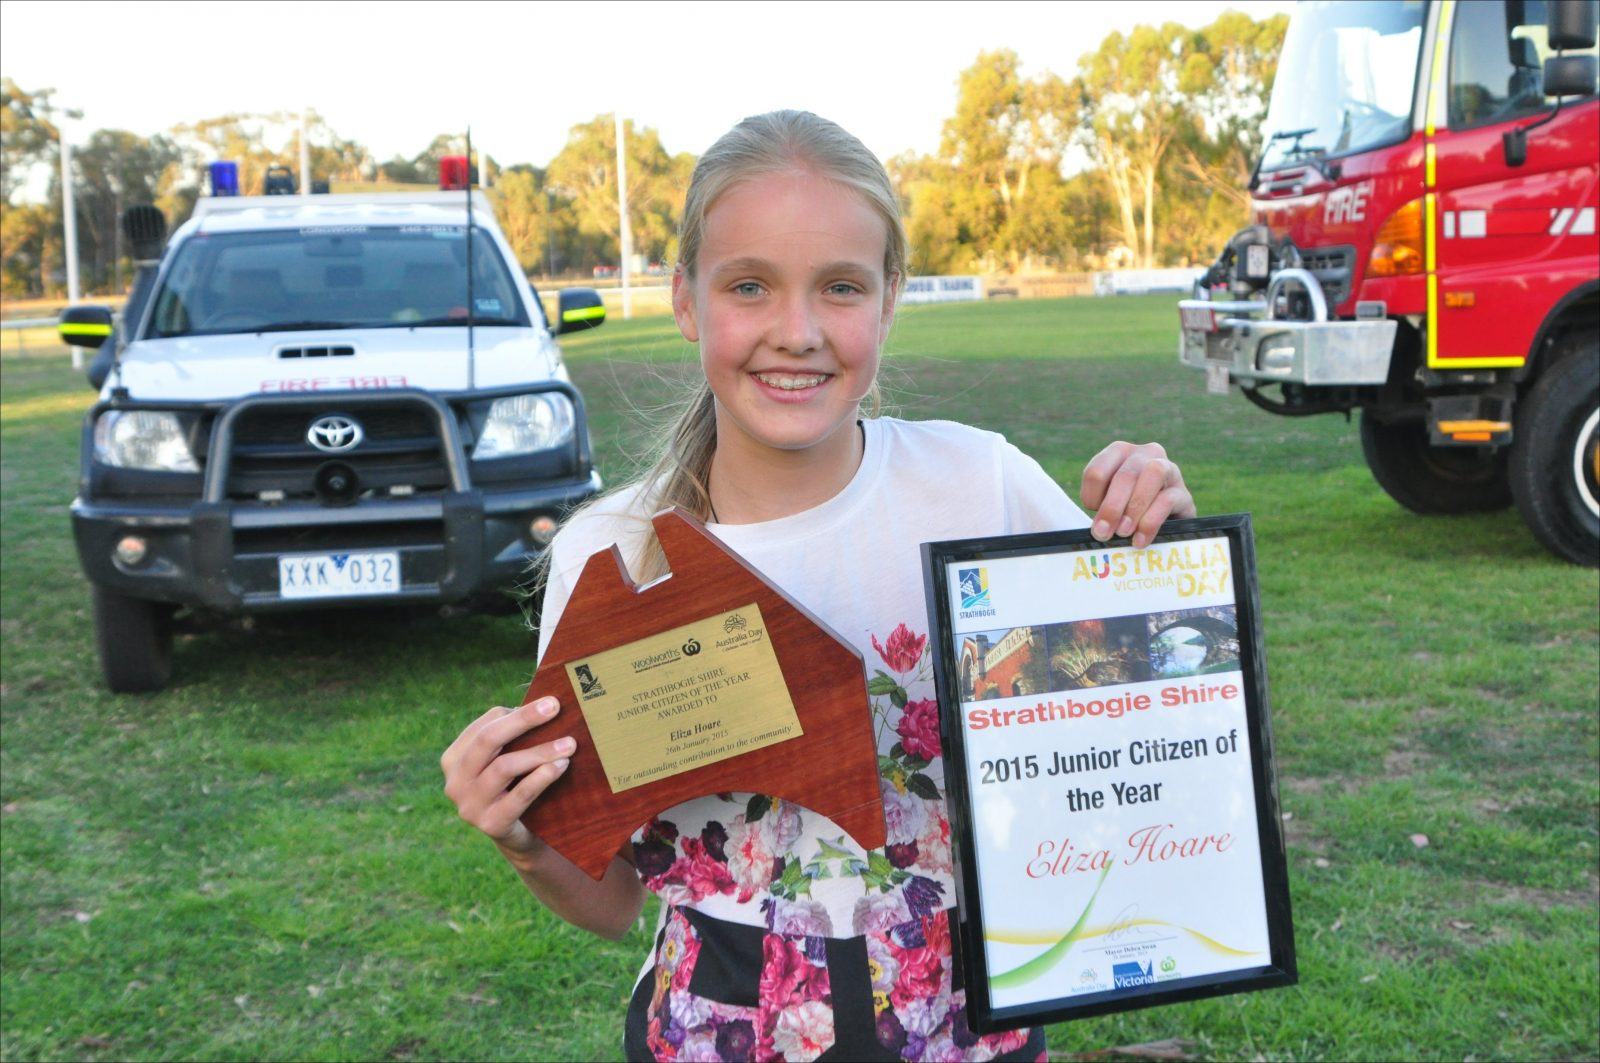 2018 Australia Day Award Ceremony Strathbogie